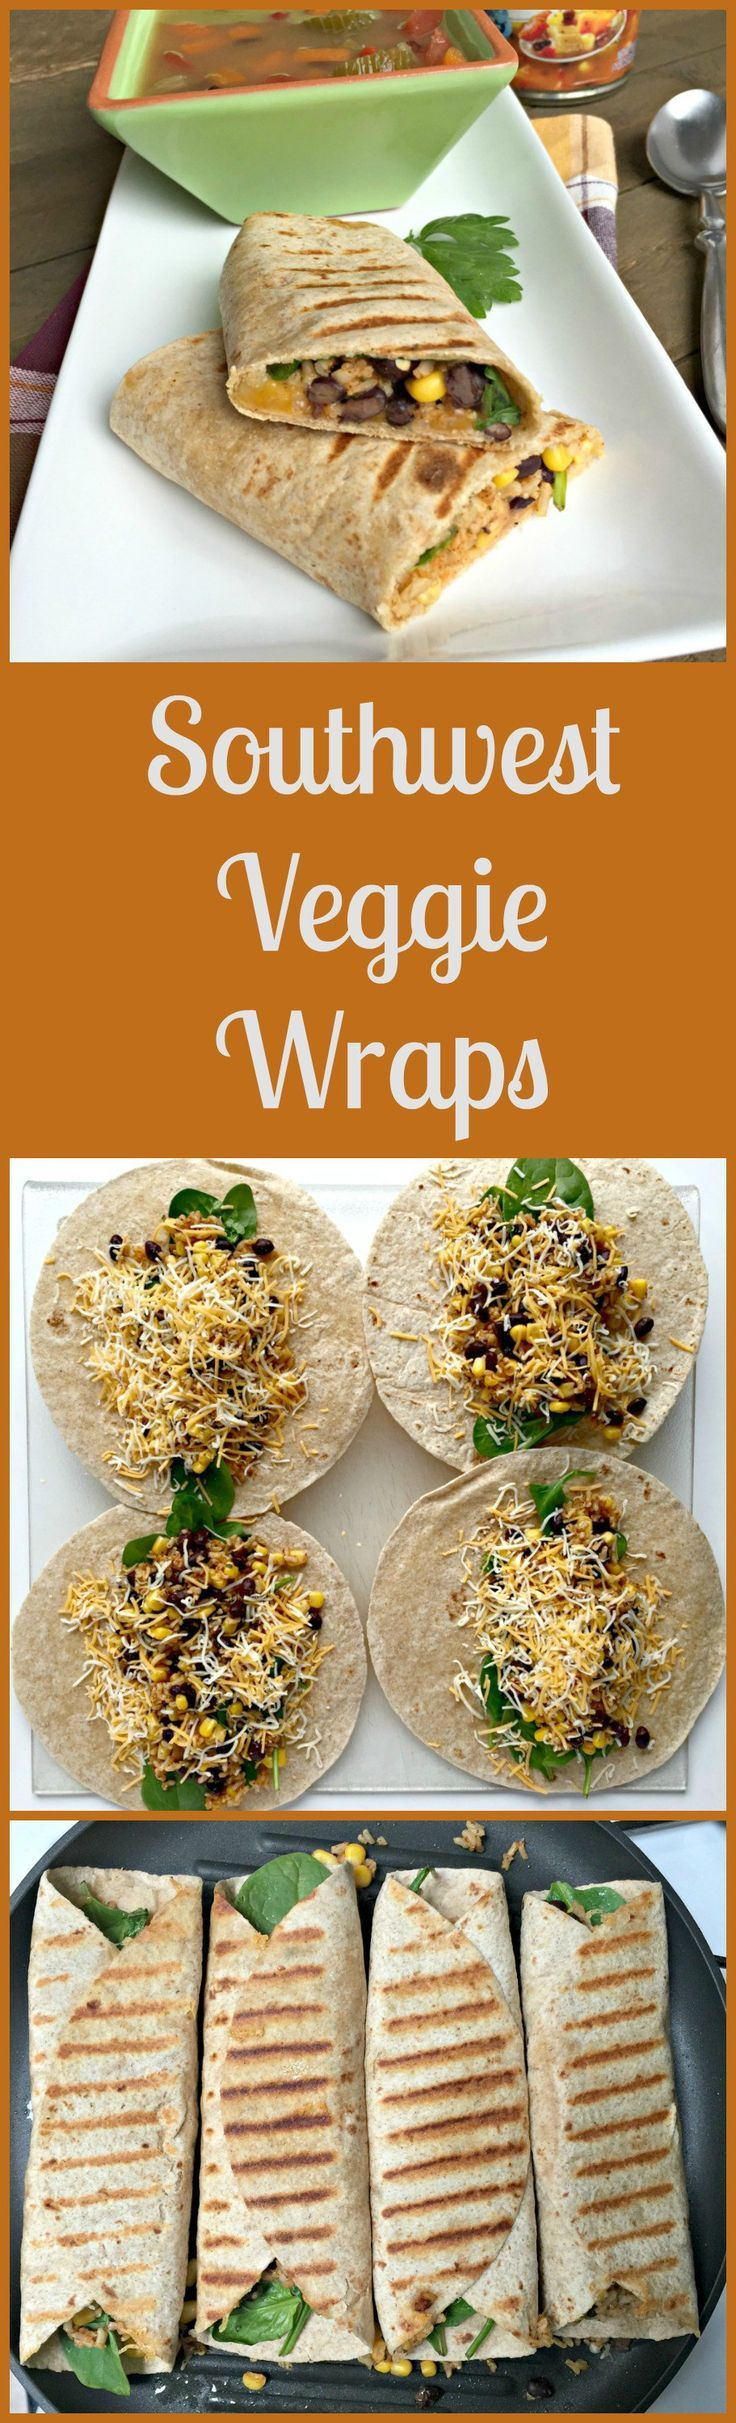 Southwest Veggie Wraps #EatLightEatRight#ad